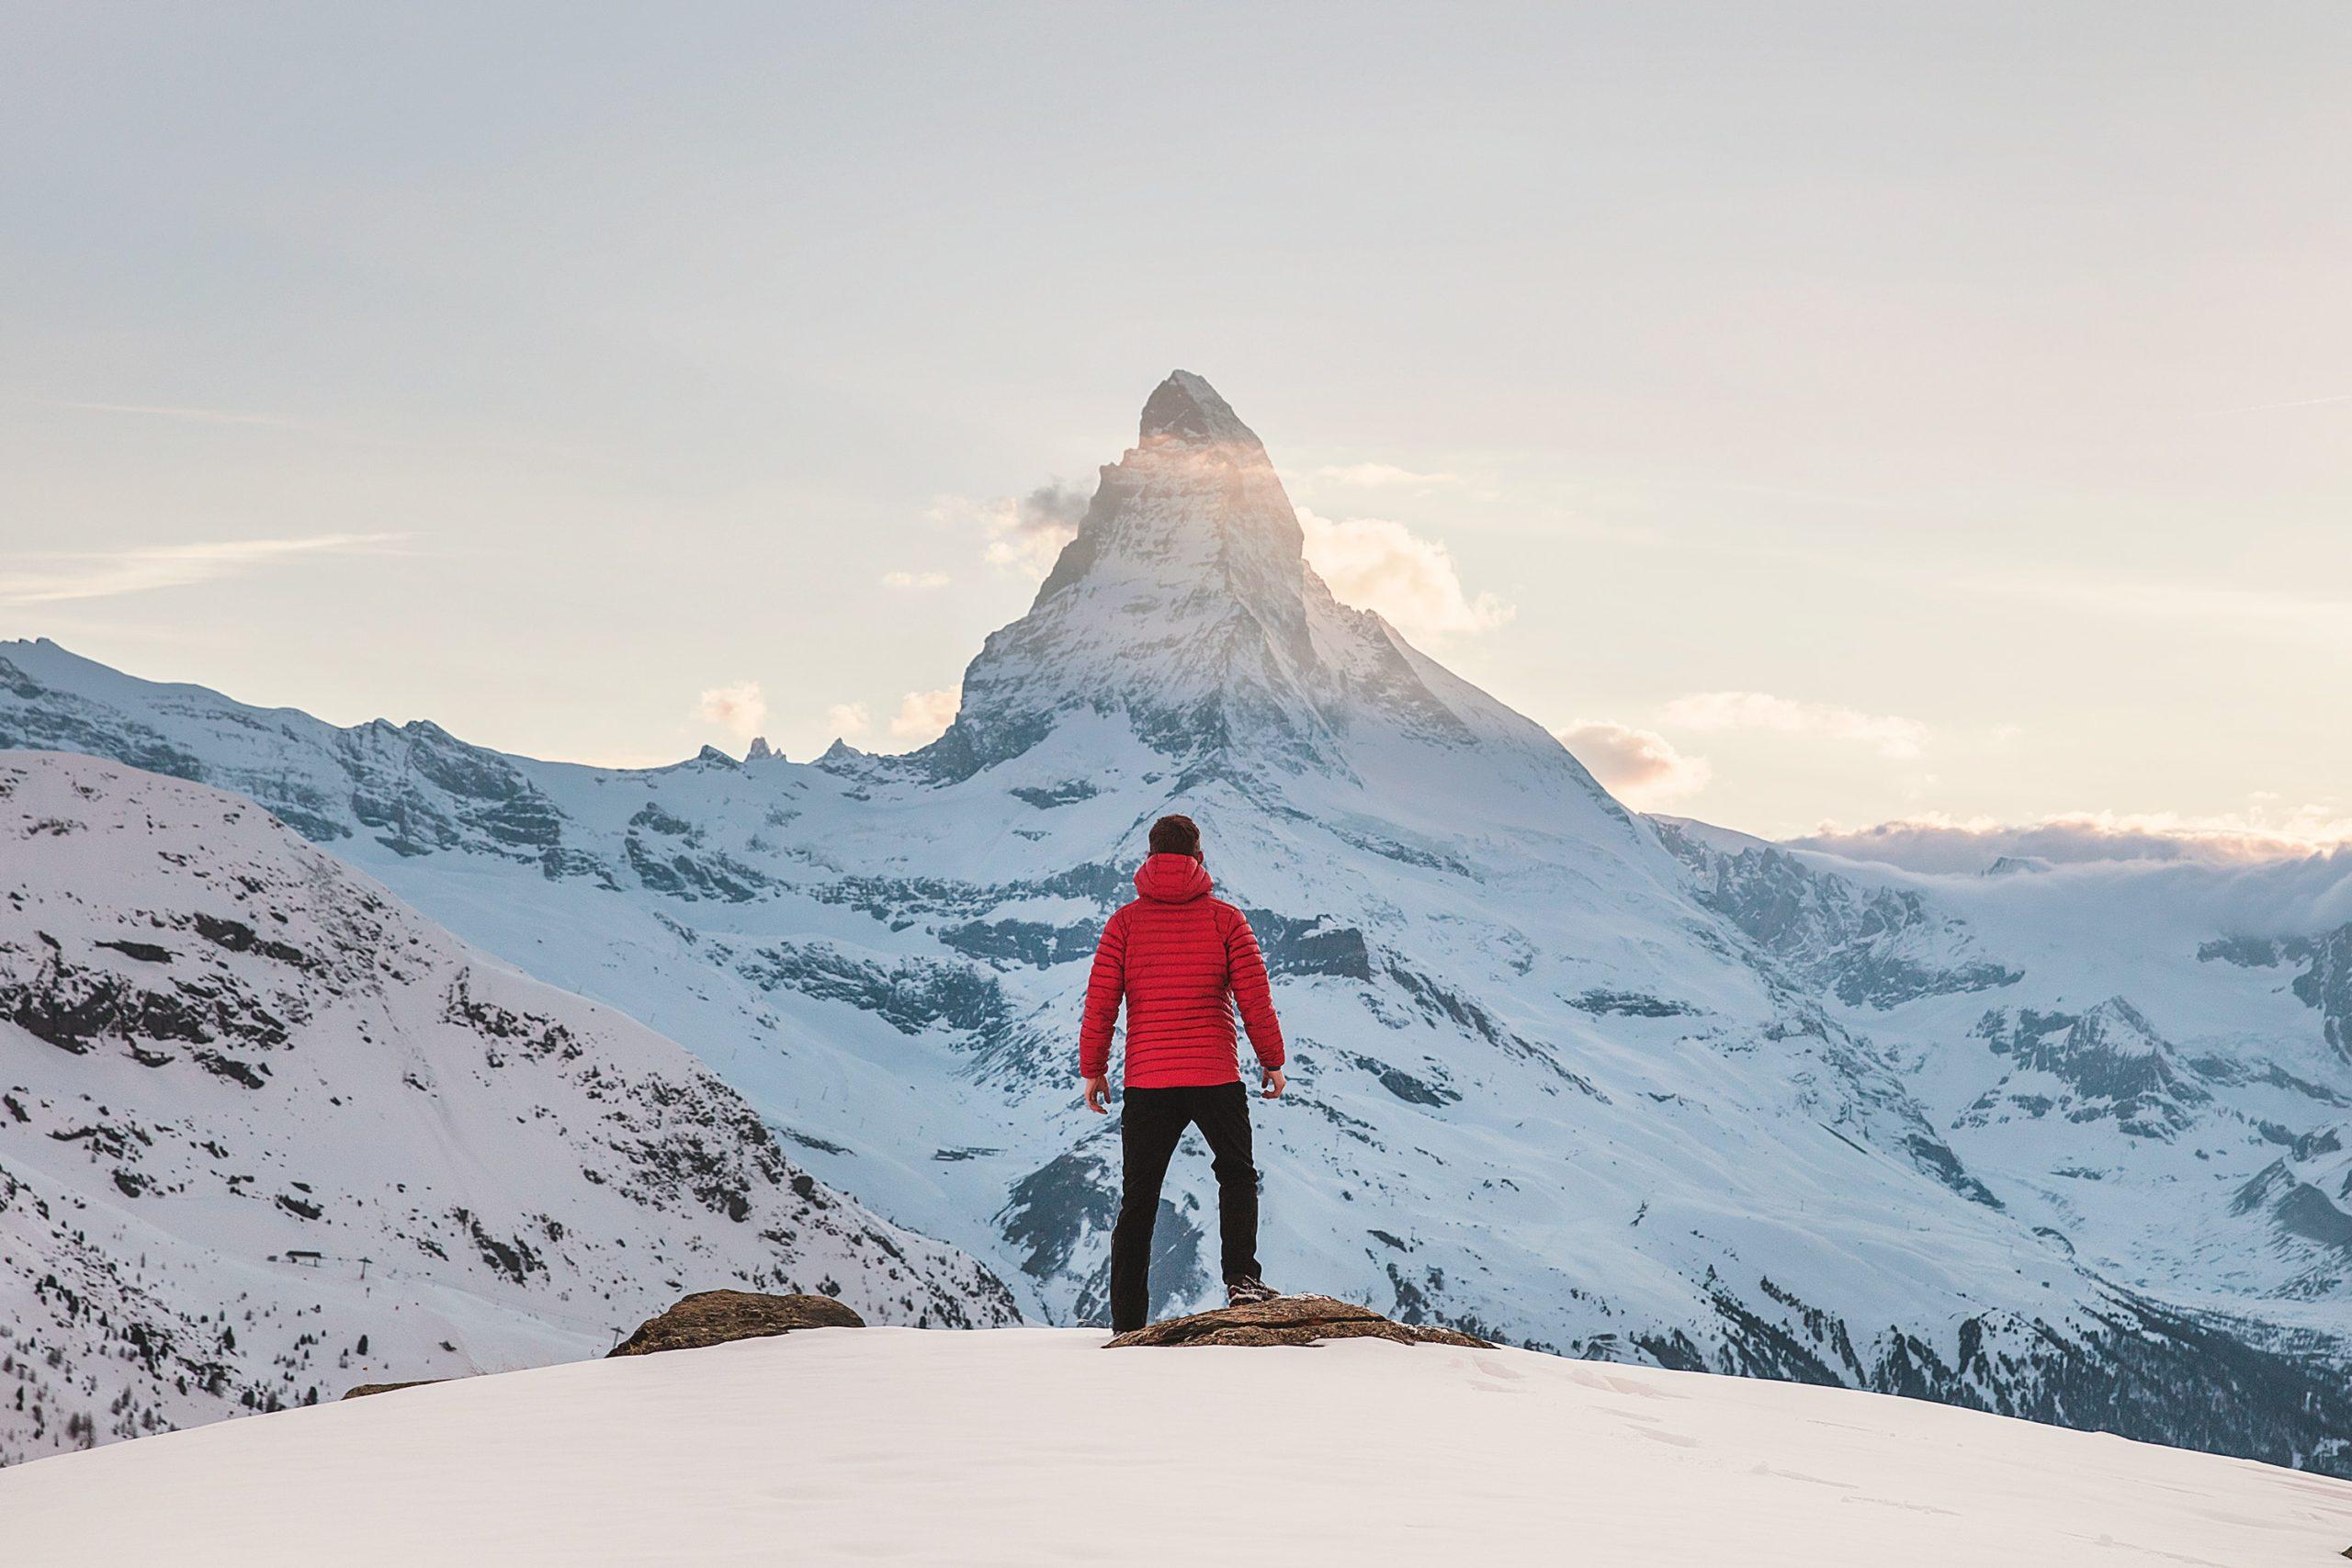 Image: man preparing to hike up a mountain